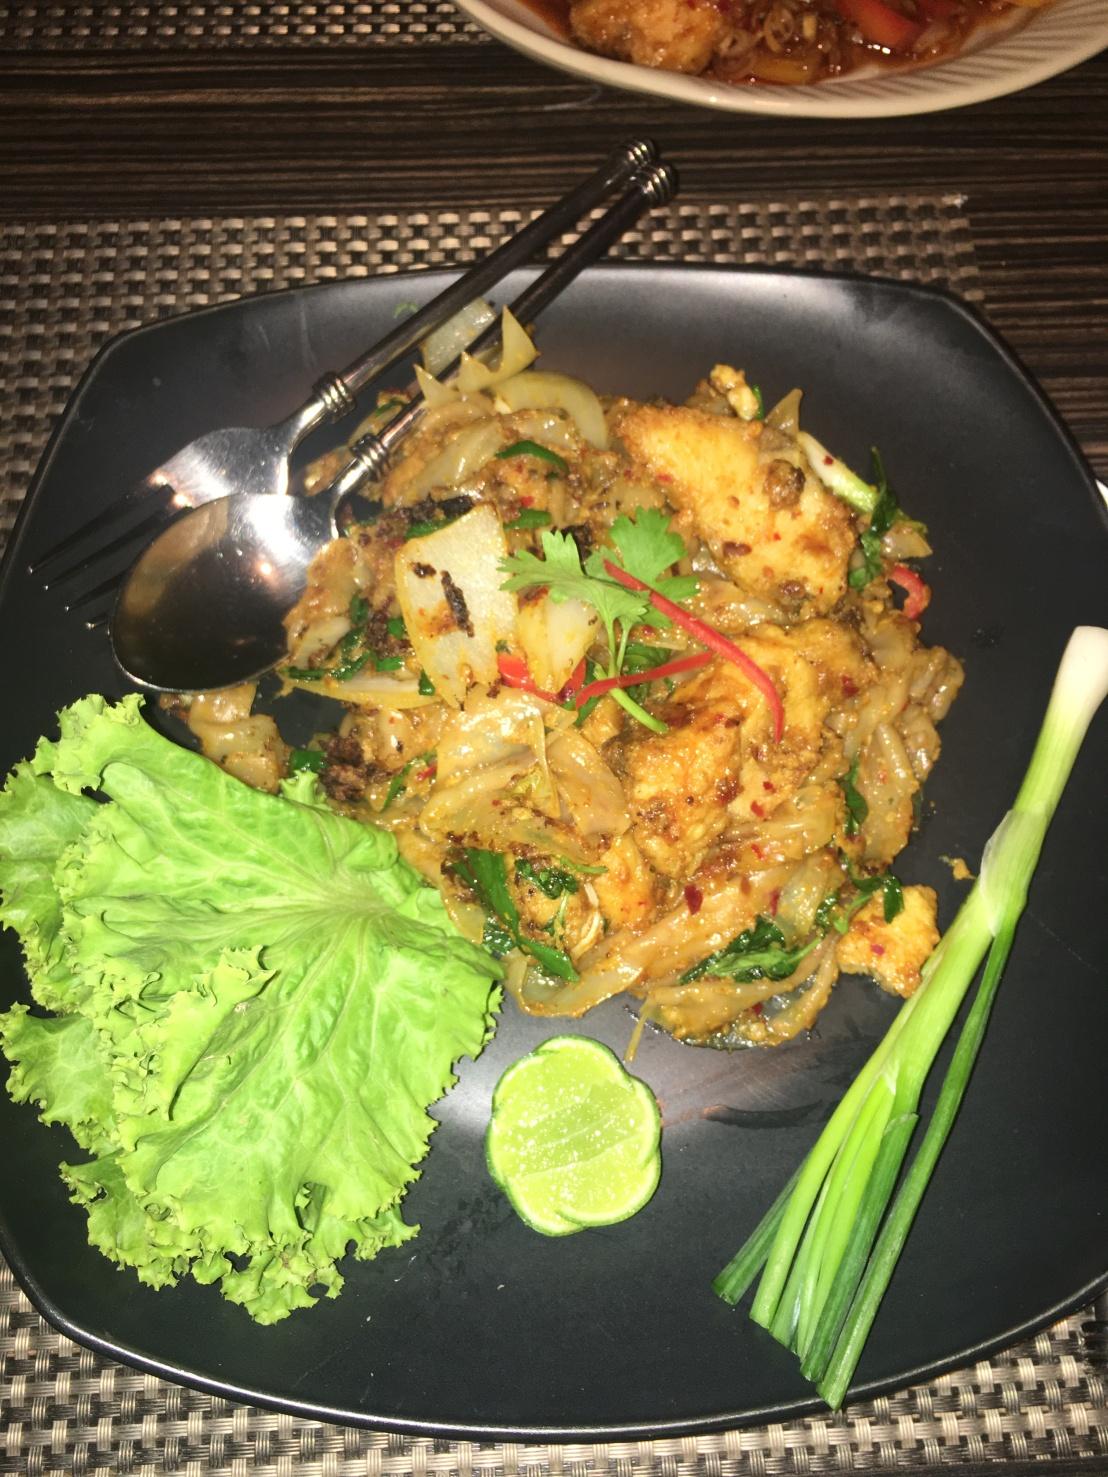 Day 1 - Bangkok - Dinner @ Ruen Urai 5